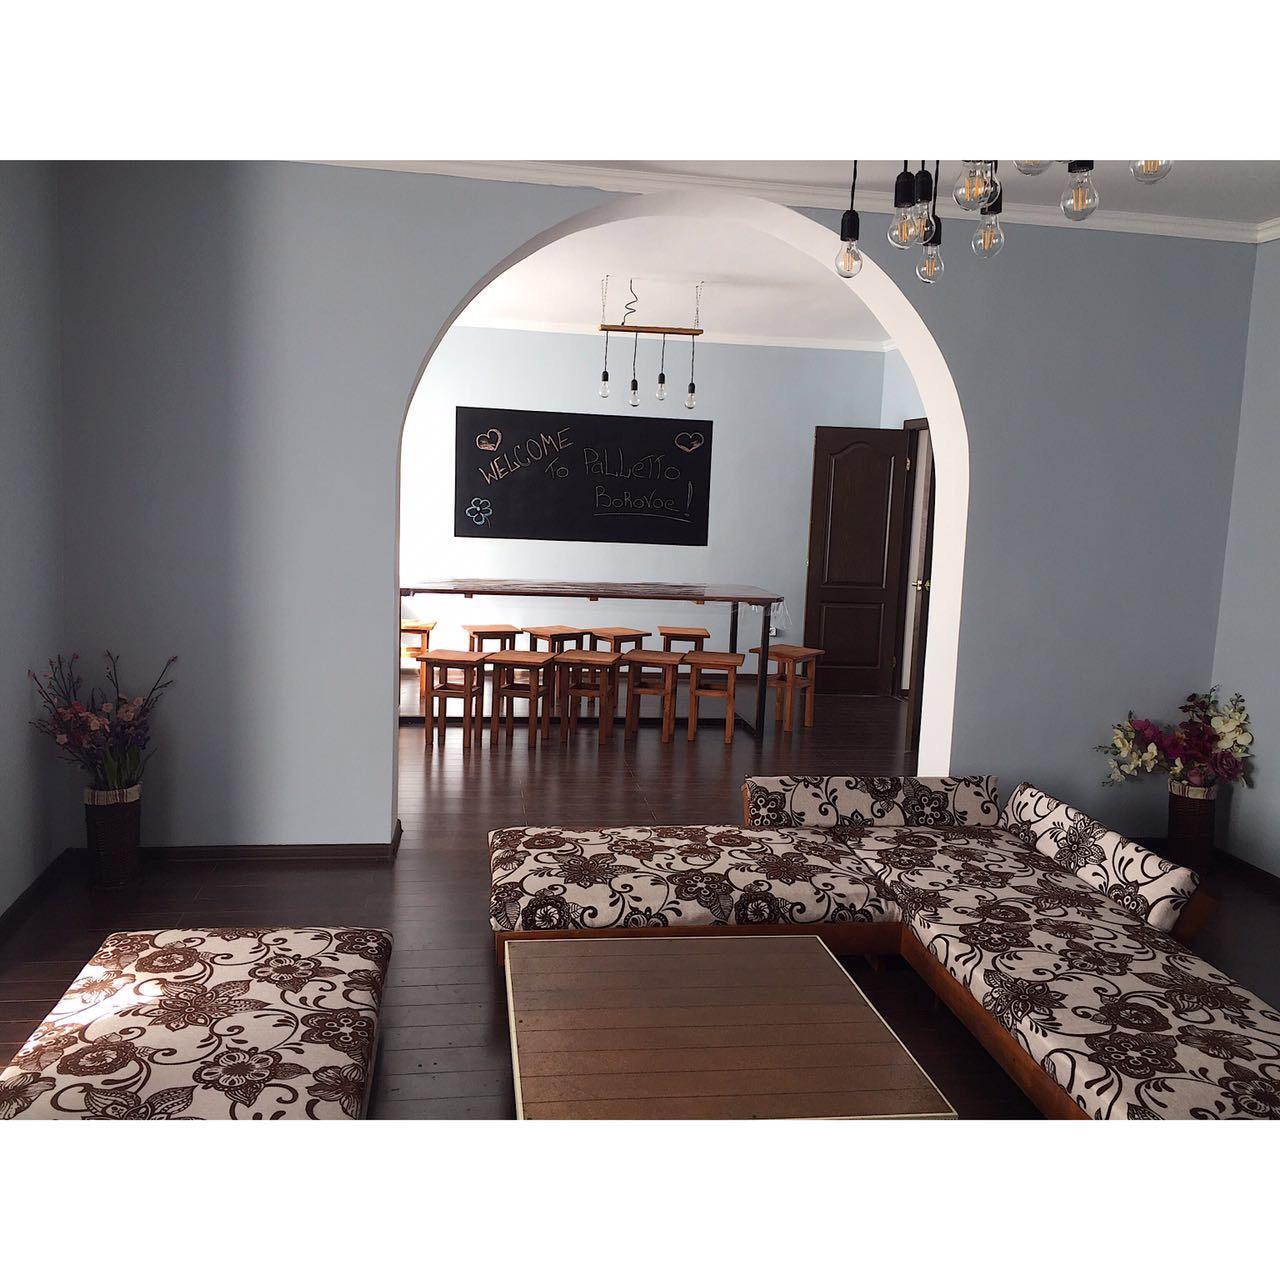 Guest House Palletto Borovoe